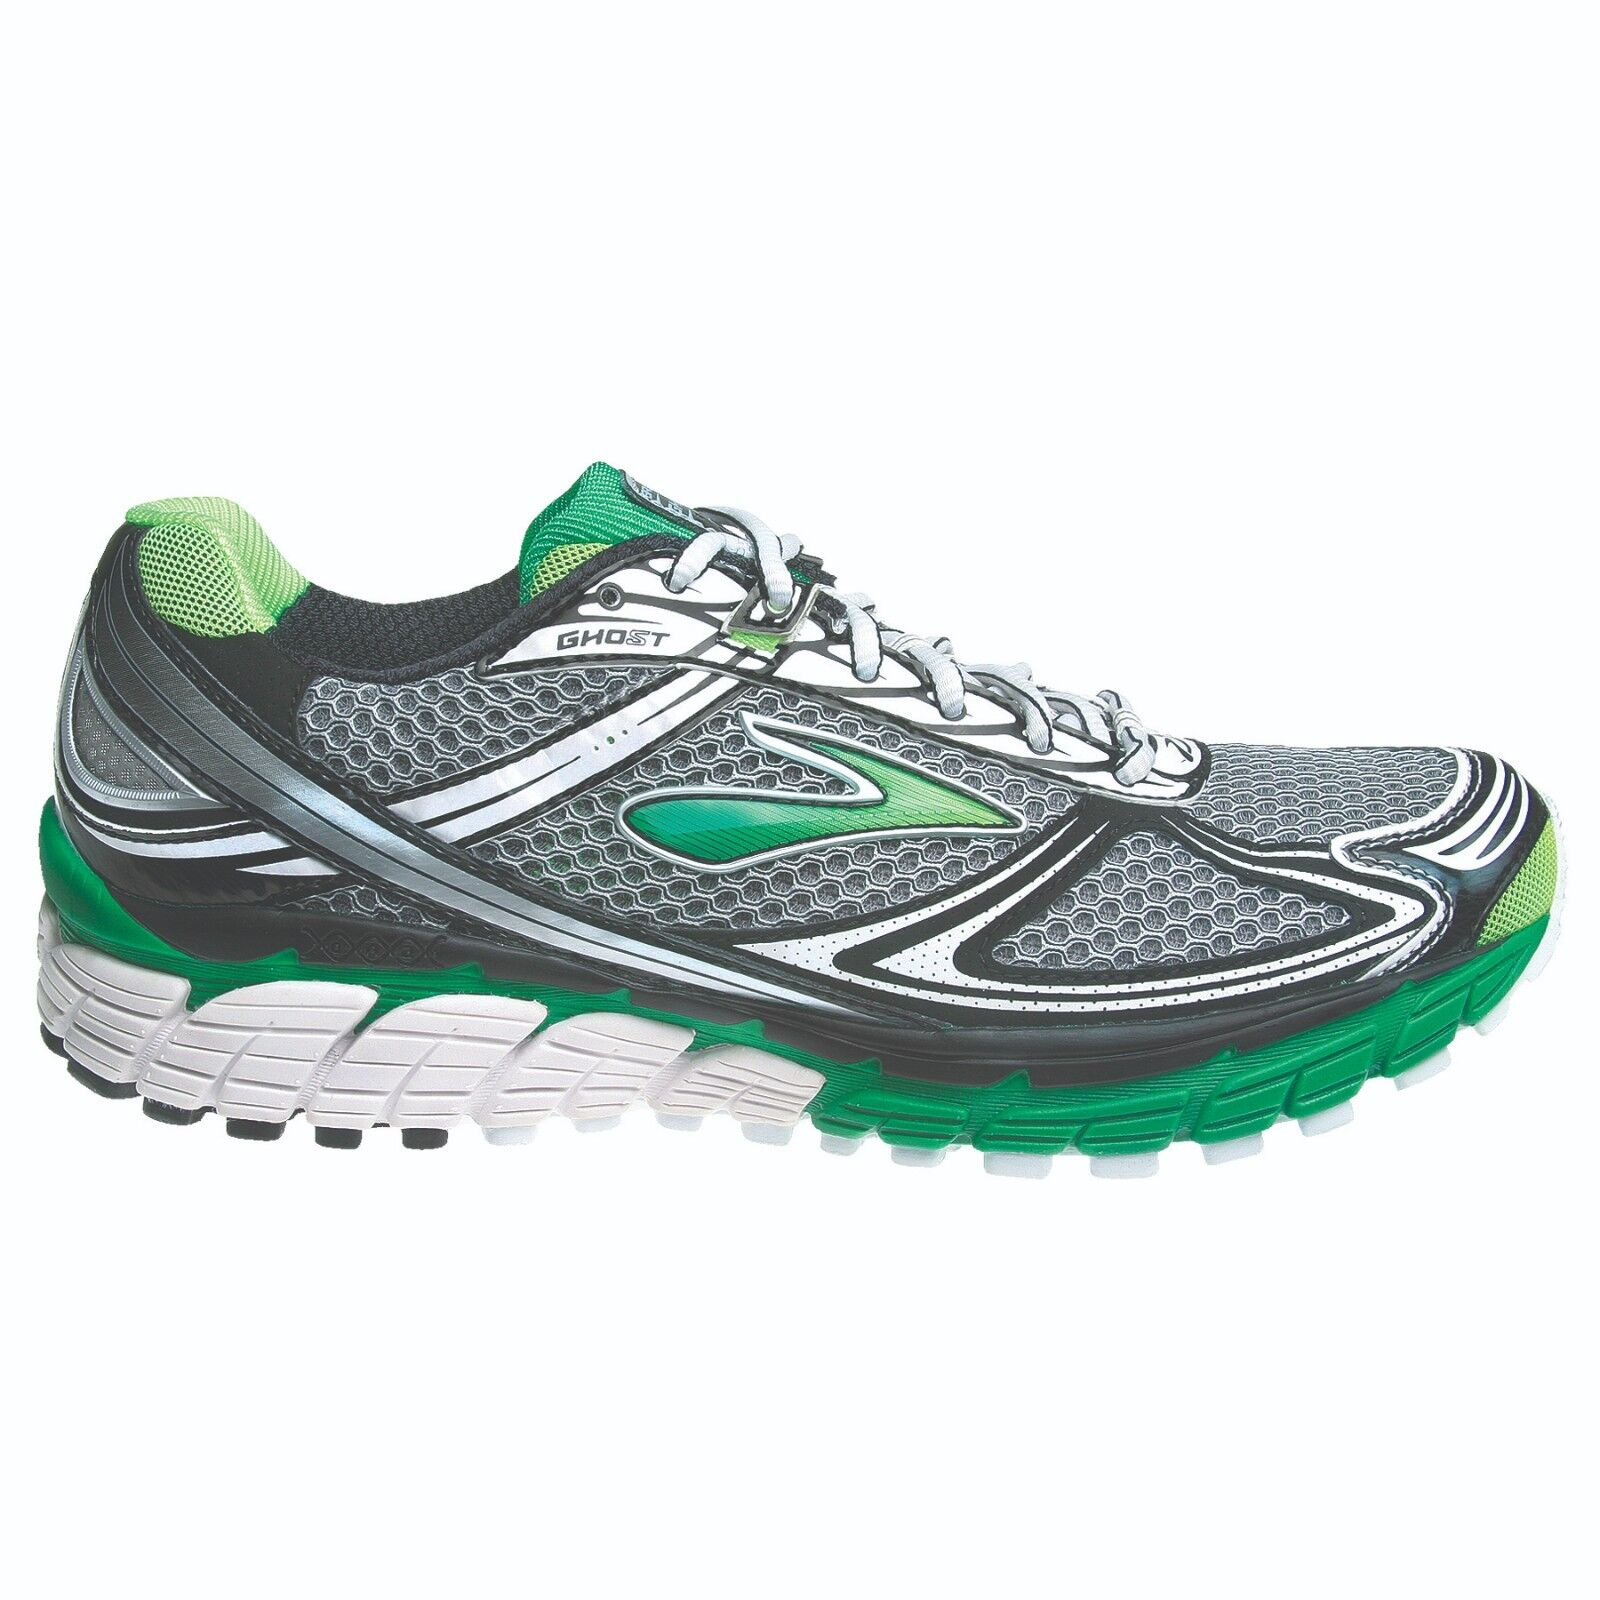 Brooks Ghost 5 Mens Running scarpe (D) (330) (330) (330) + FREE AUS POSTAGE 74e9da